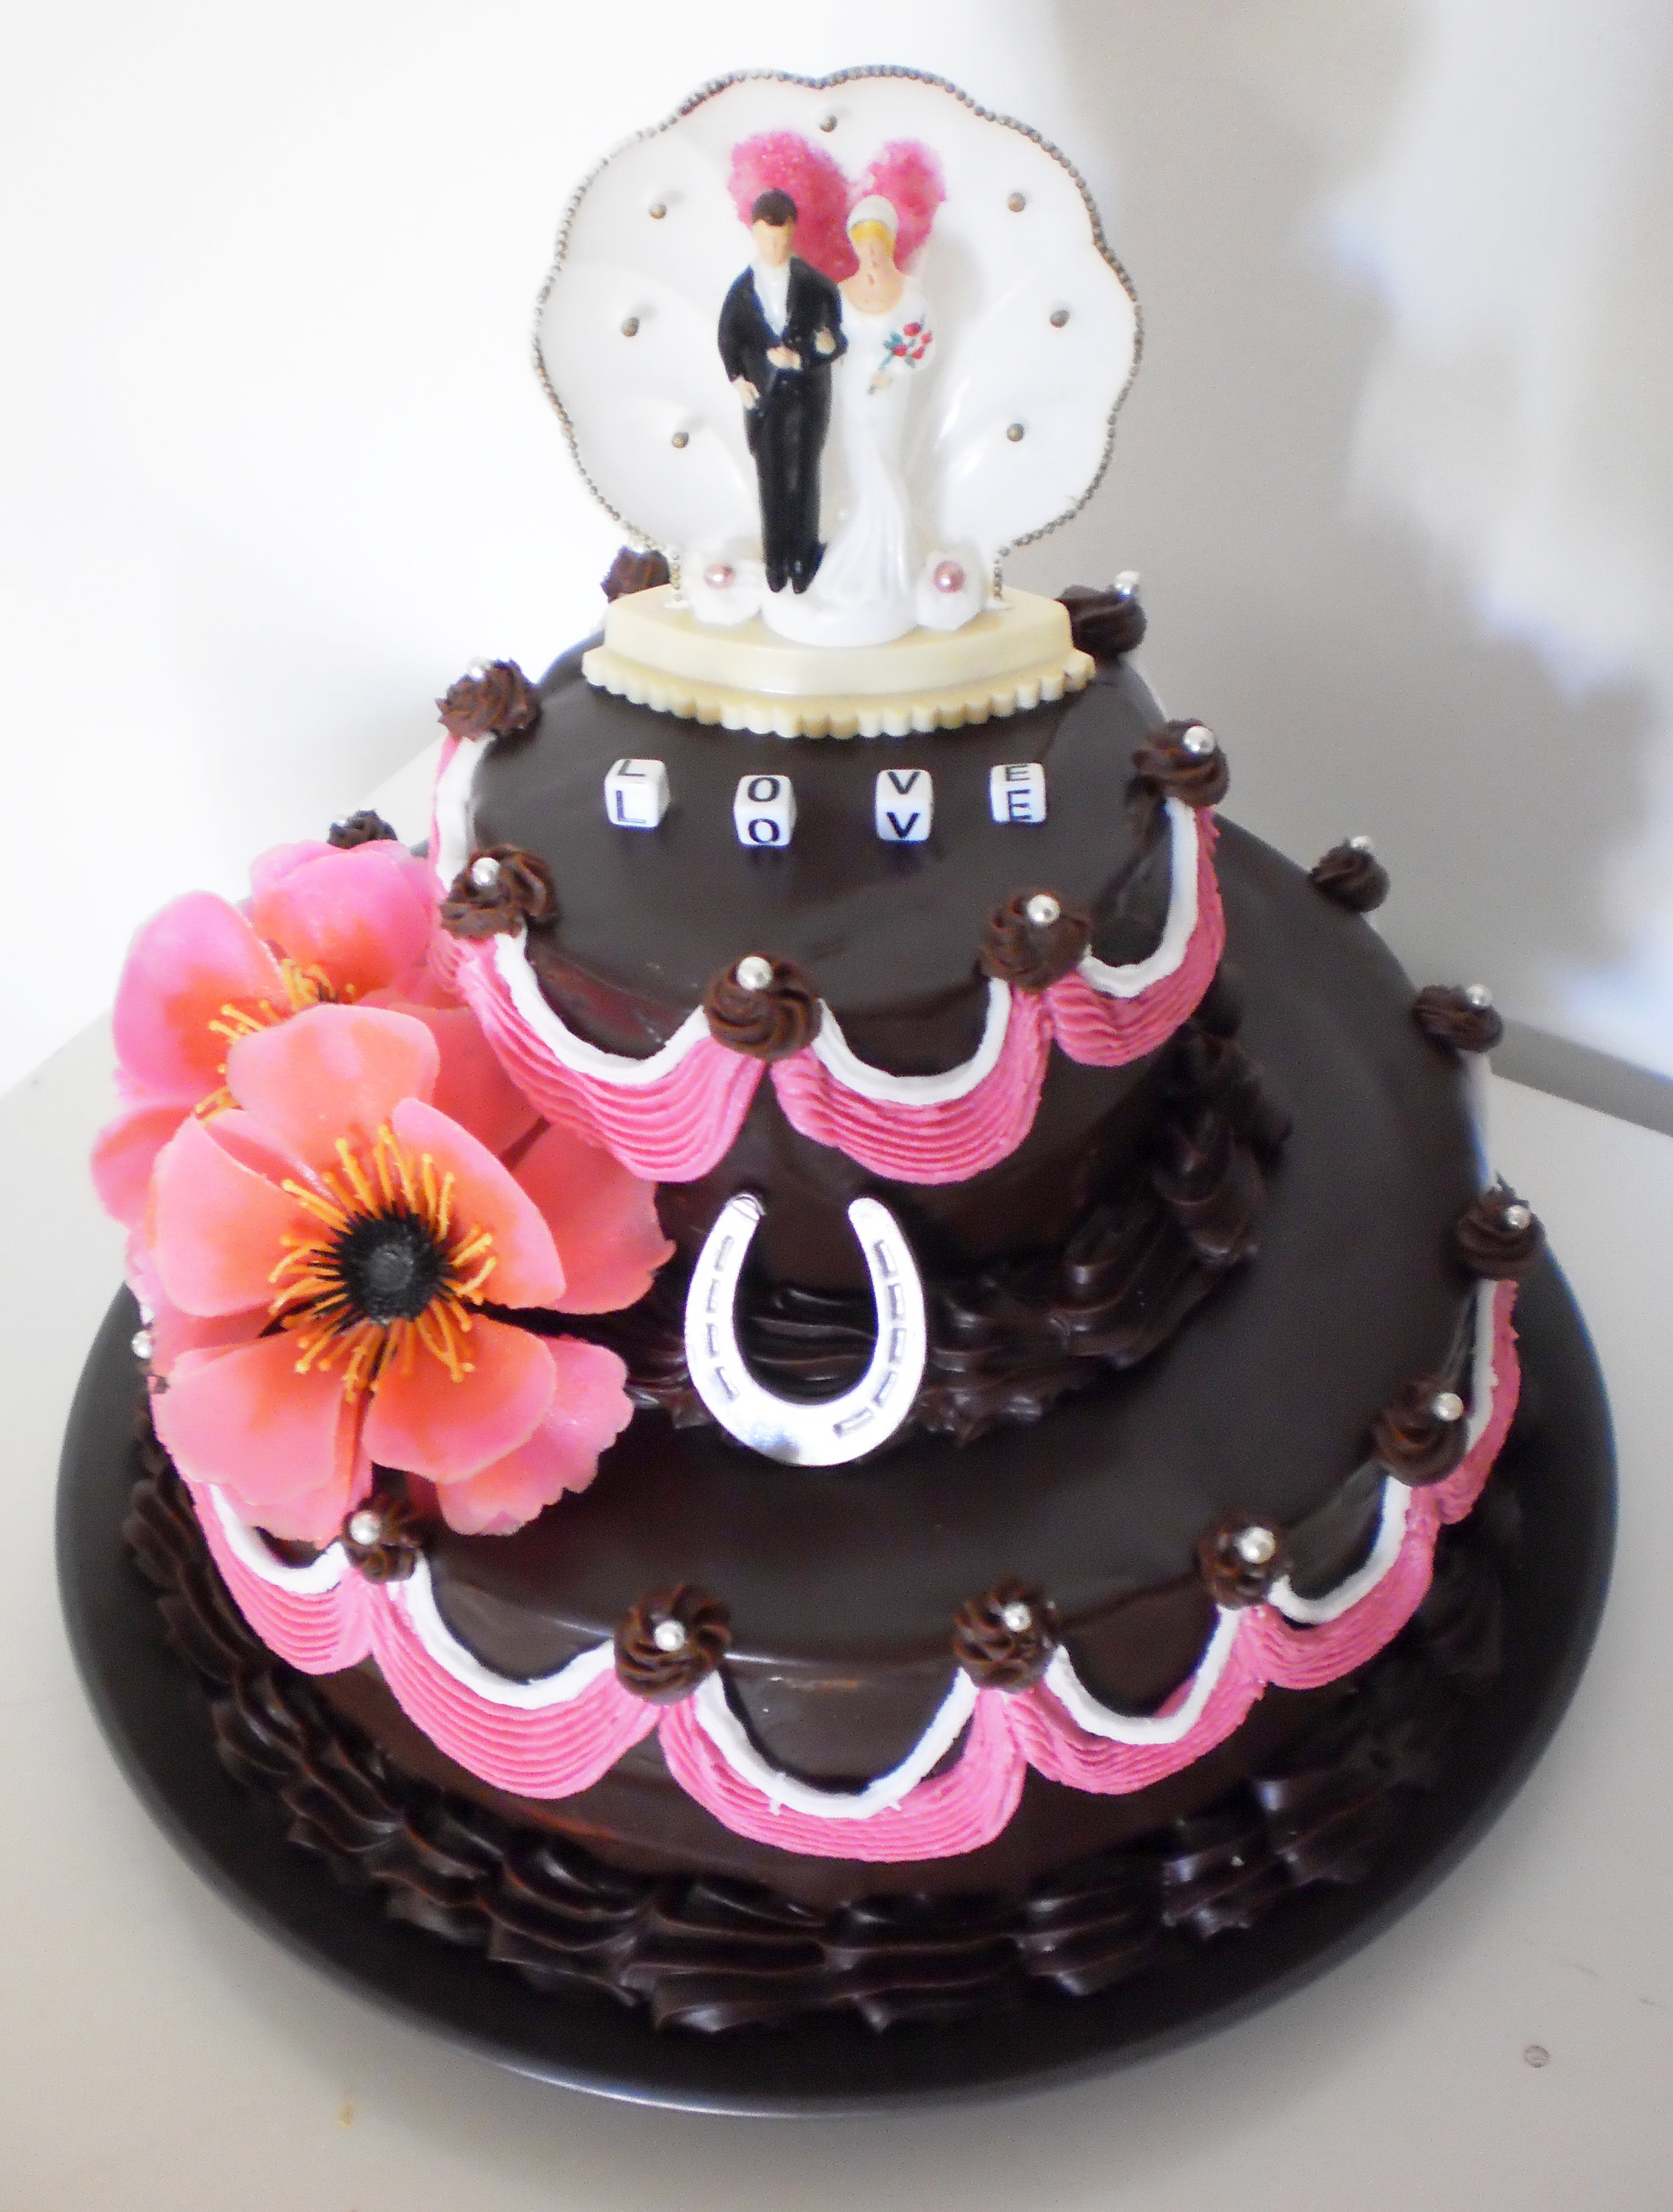 Tiny Wedding Cake for a tiny wedding